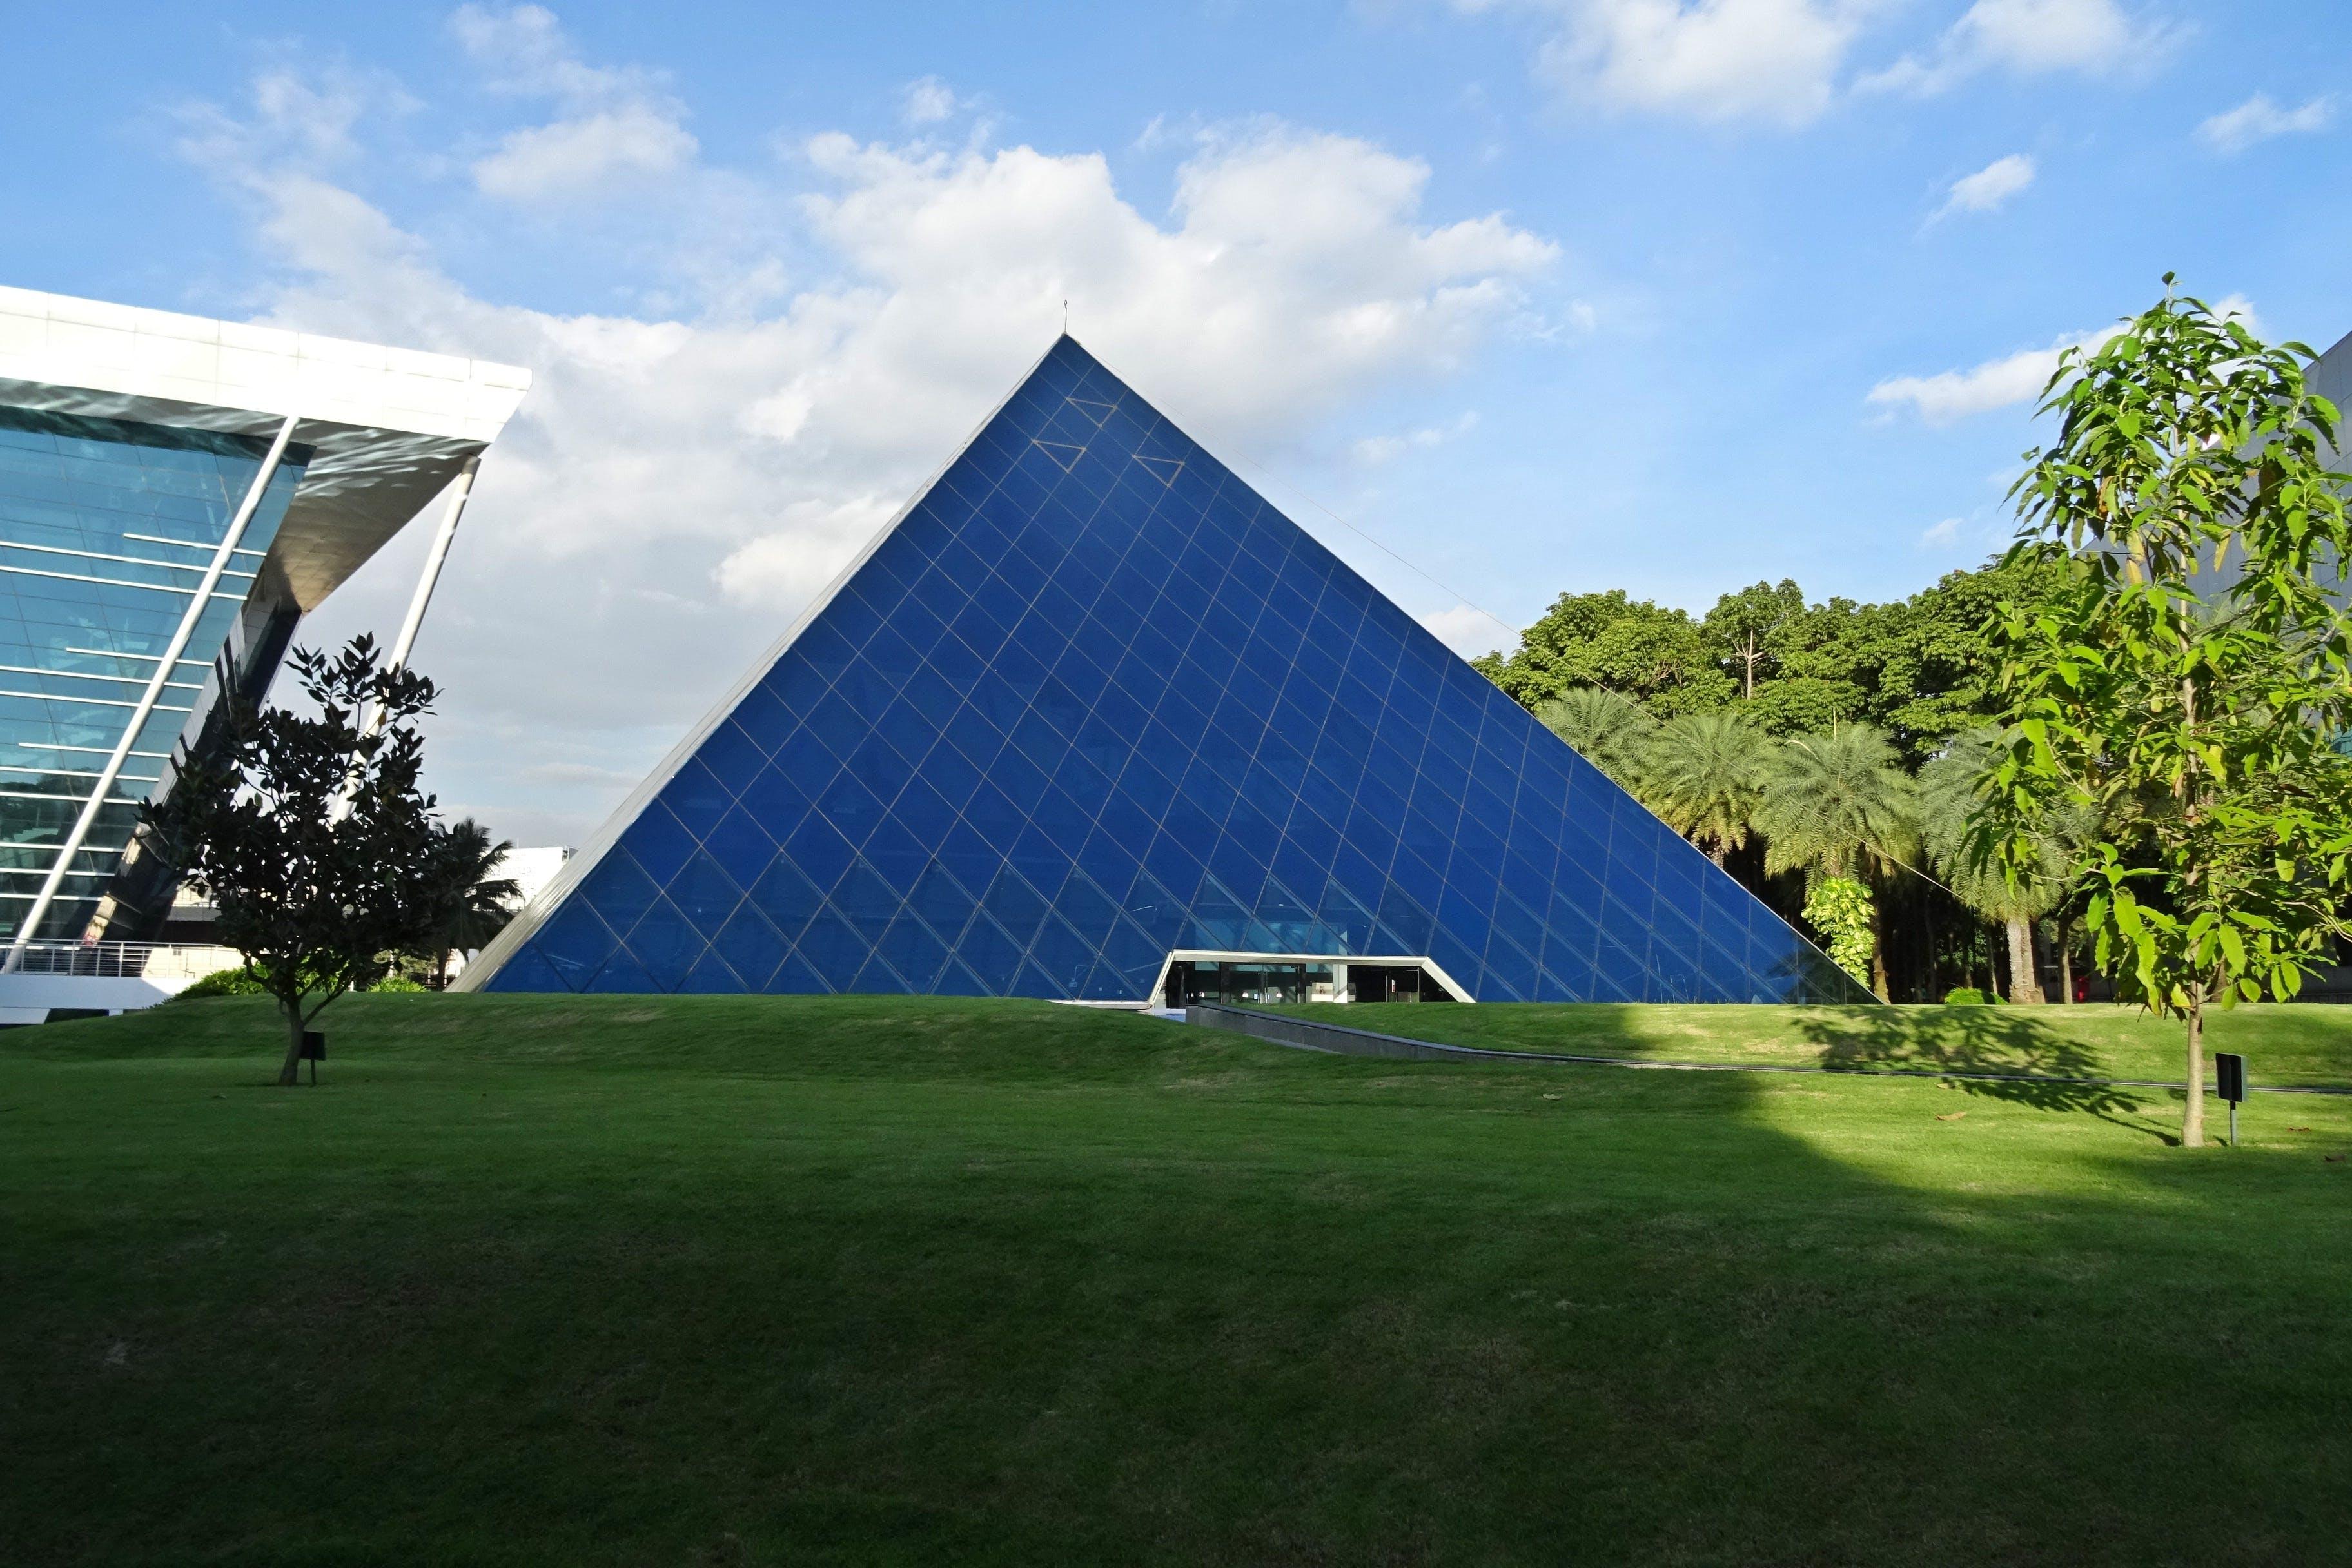 Blue Pyramid Building